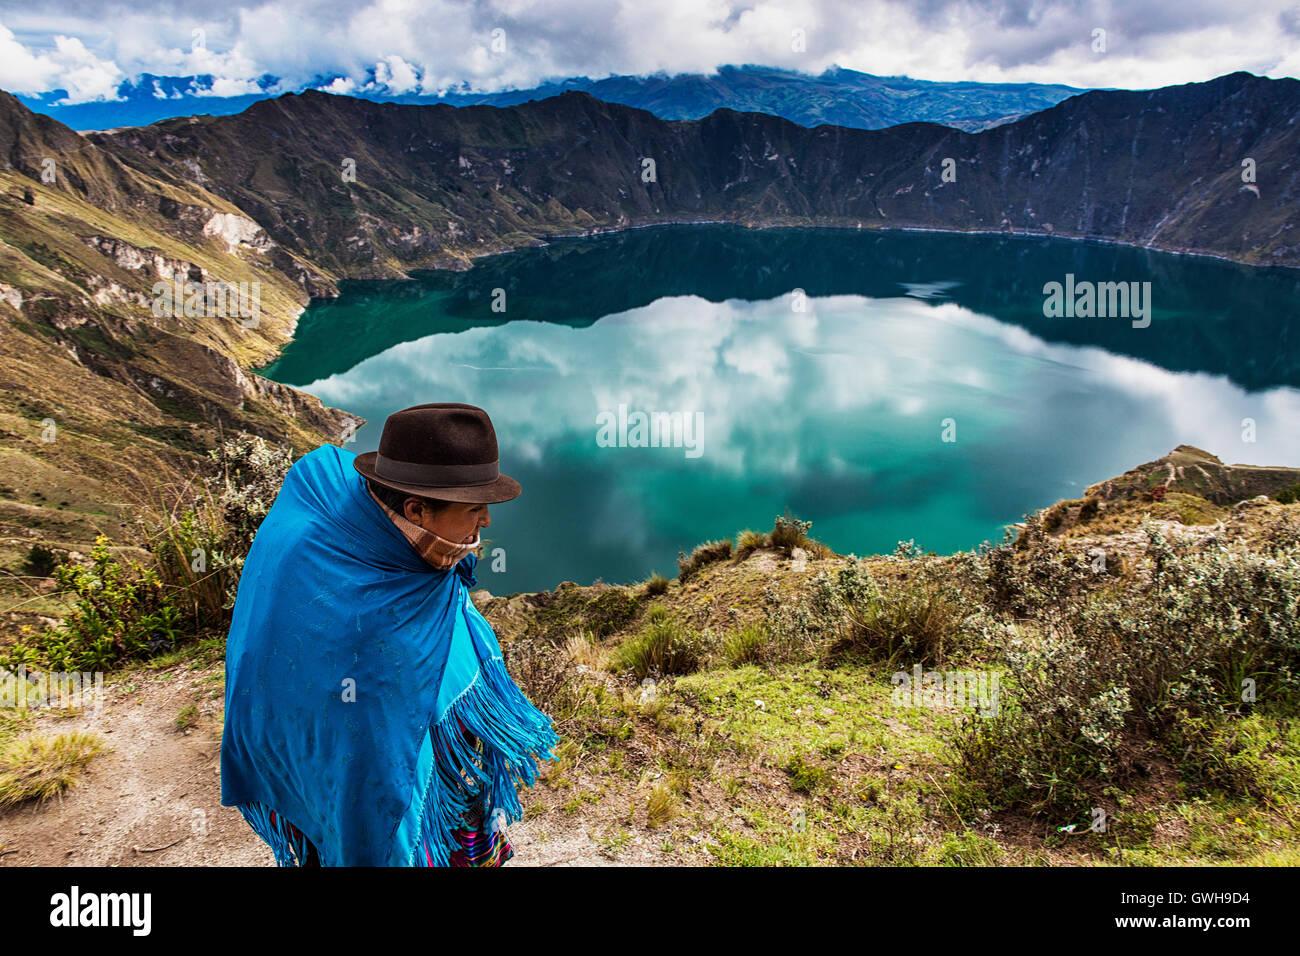 Quilotoa Ecuador - 27. Januar 2014: Ecuadorianische Frau Tracht zu Fuß in der Nähe der Vulkan Quilotoa Stockbild